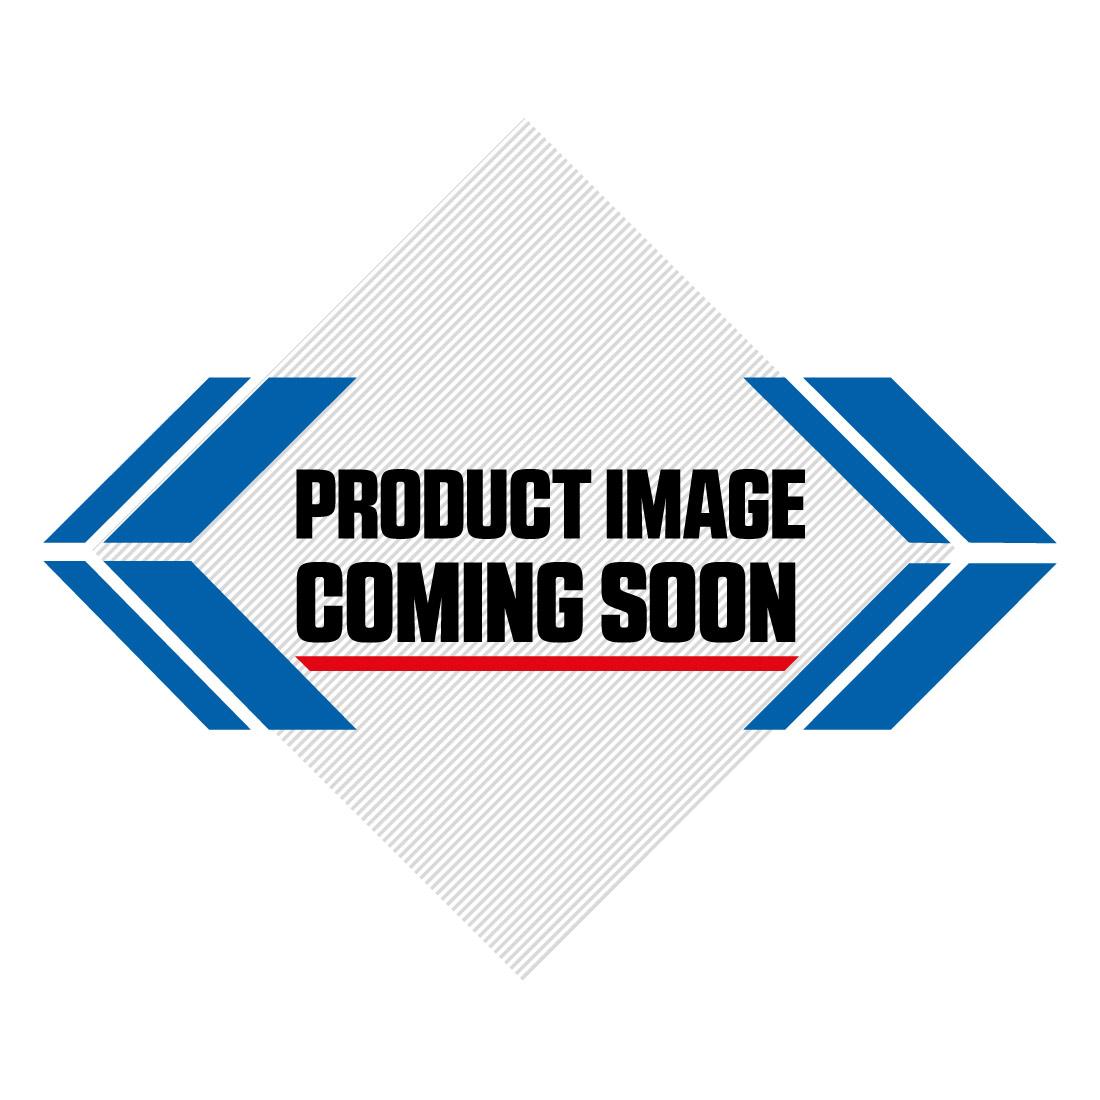 Silkolene Comp 4 10W-40 XP Ester Based Semi Synthetic Bike Engine Oil - 4 Cube